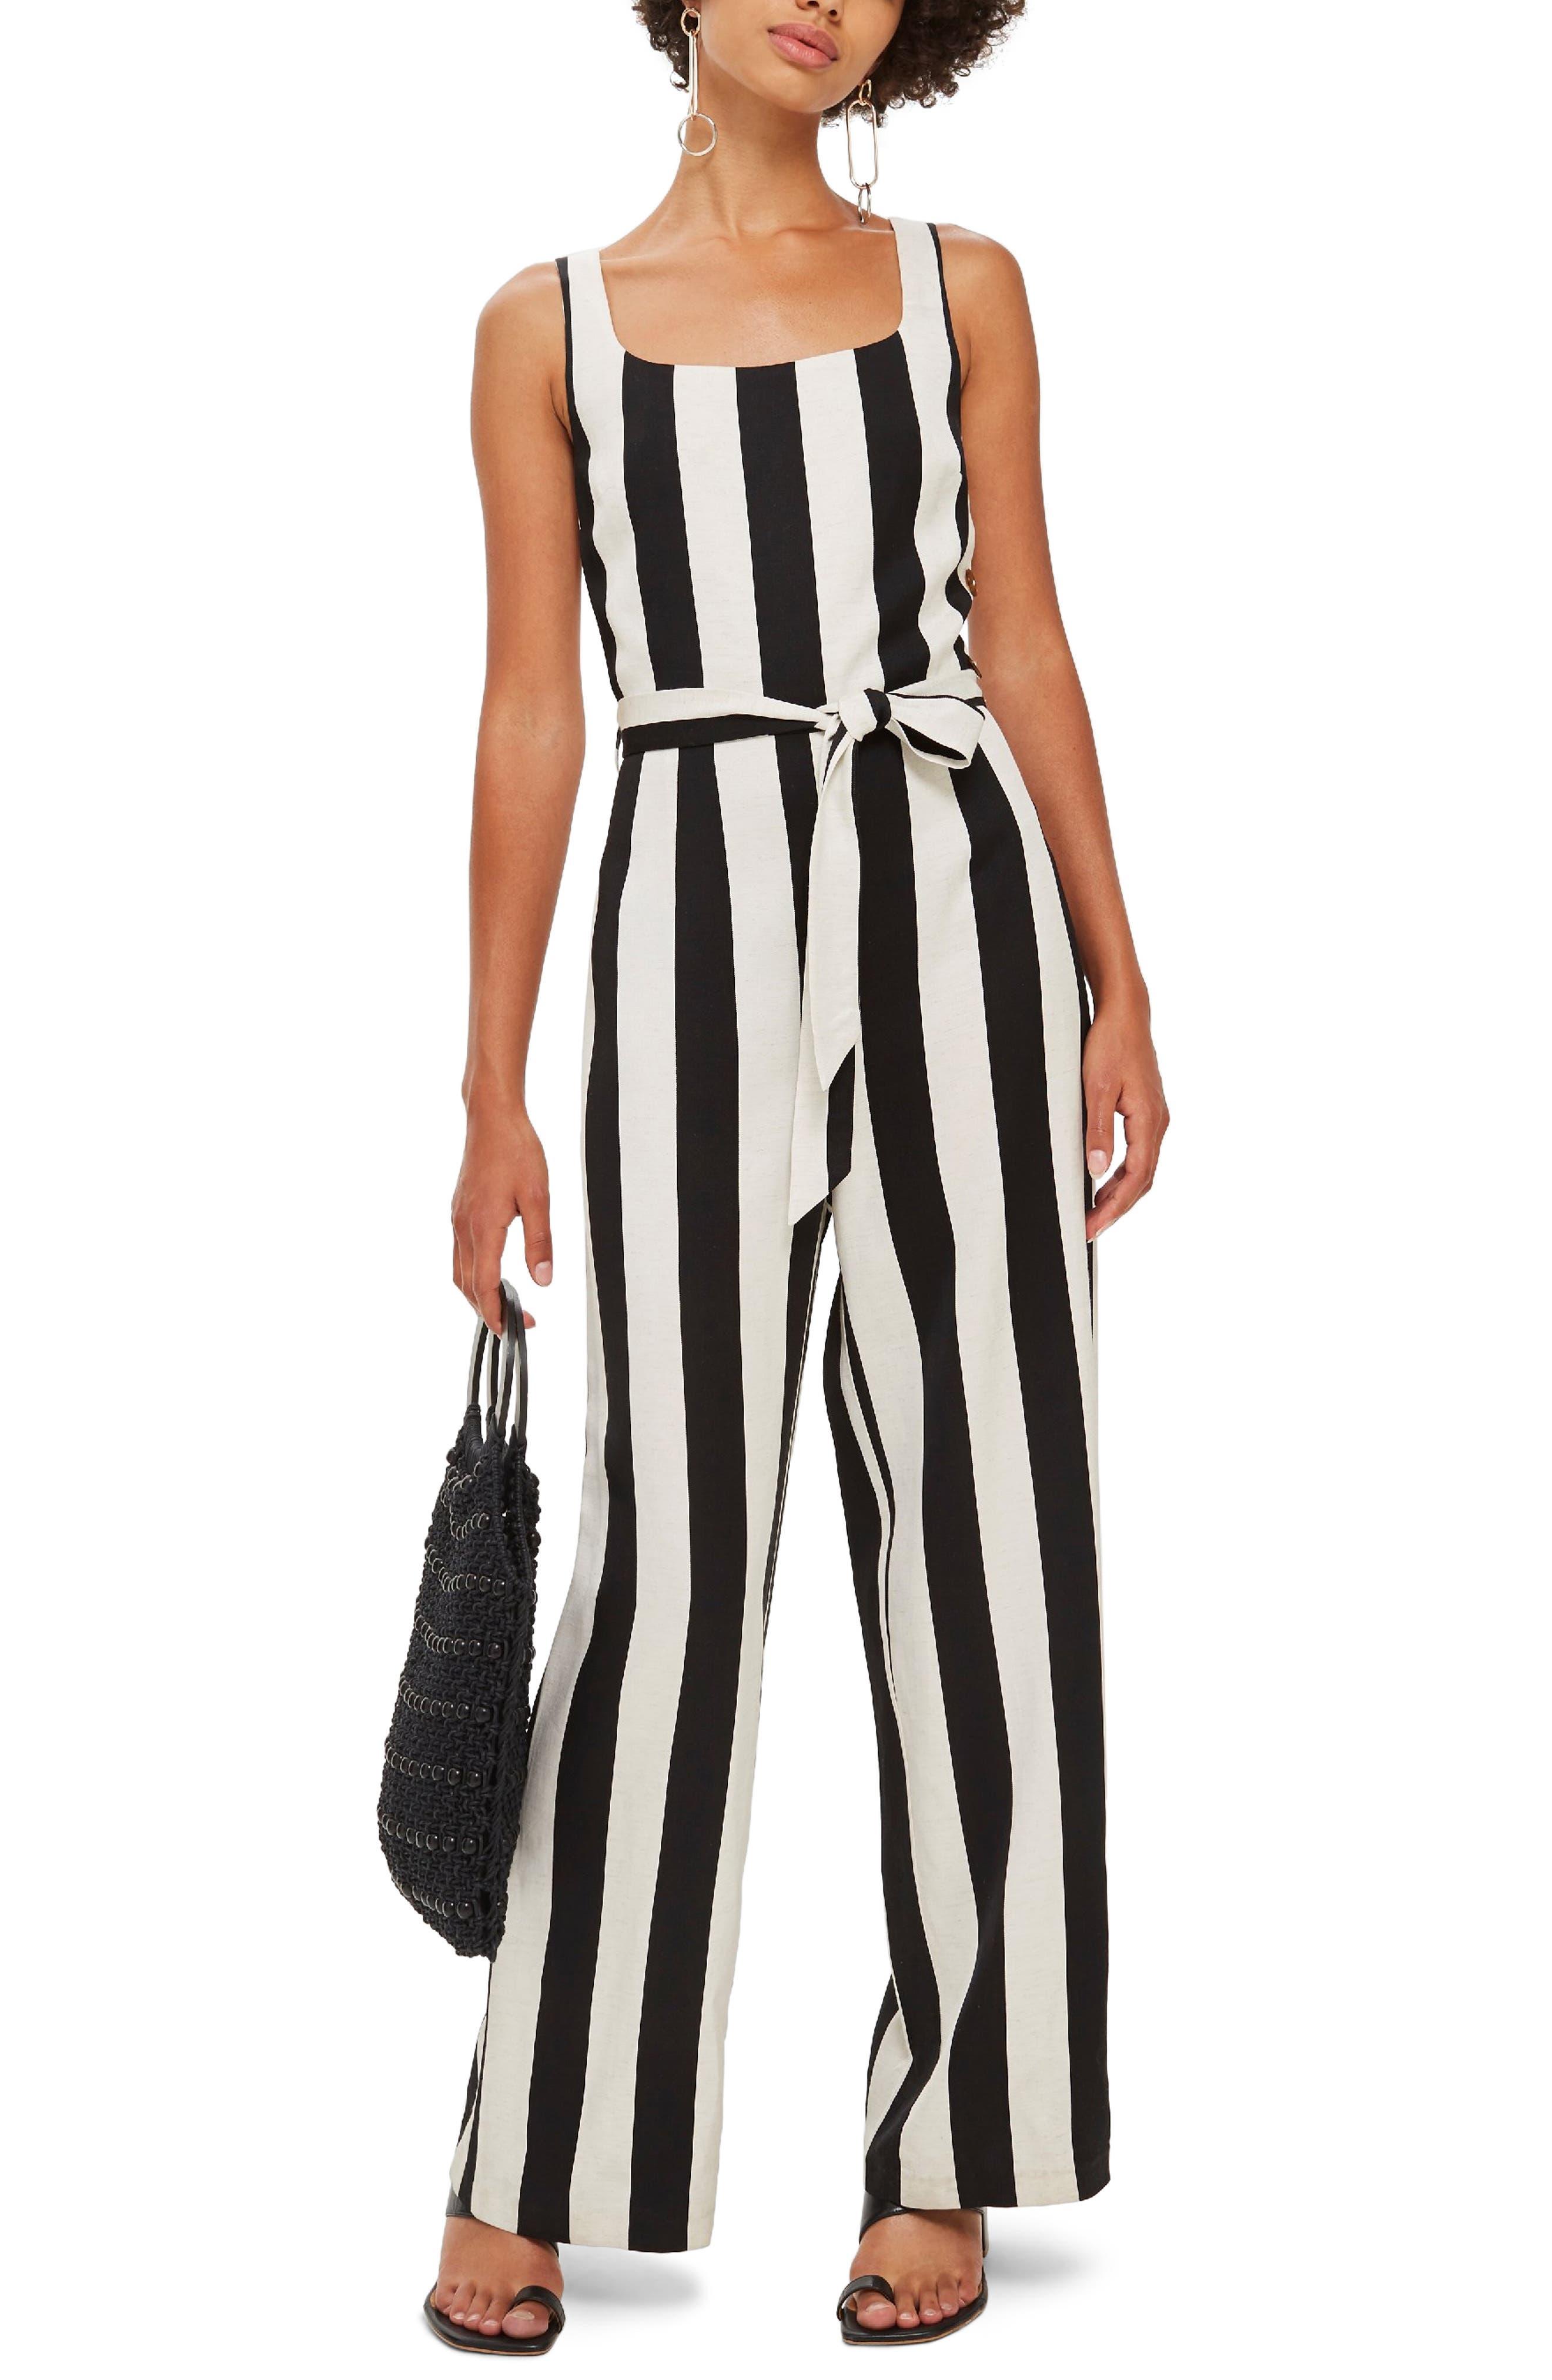 Humbug Striped Jumpsuit,                         Main,                         color, BLACK MULTI